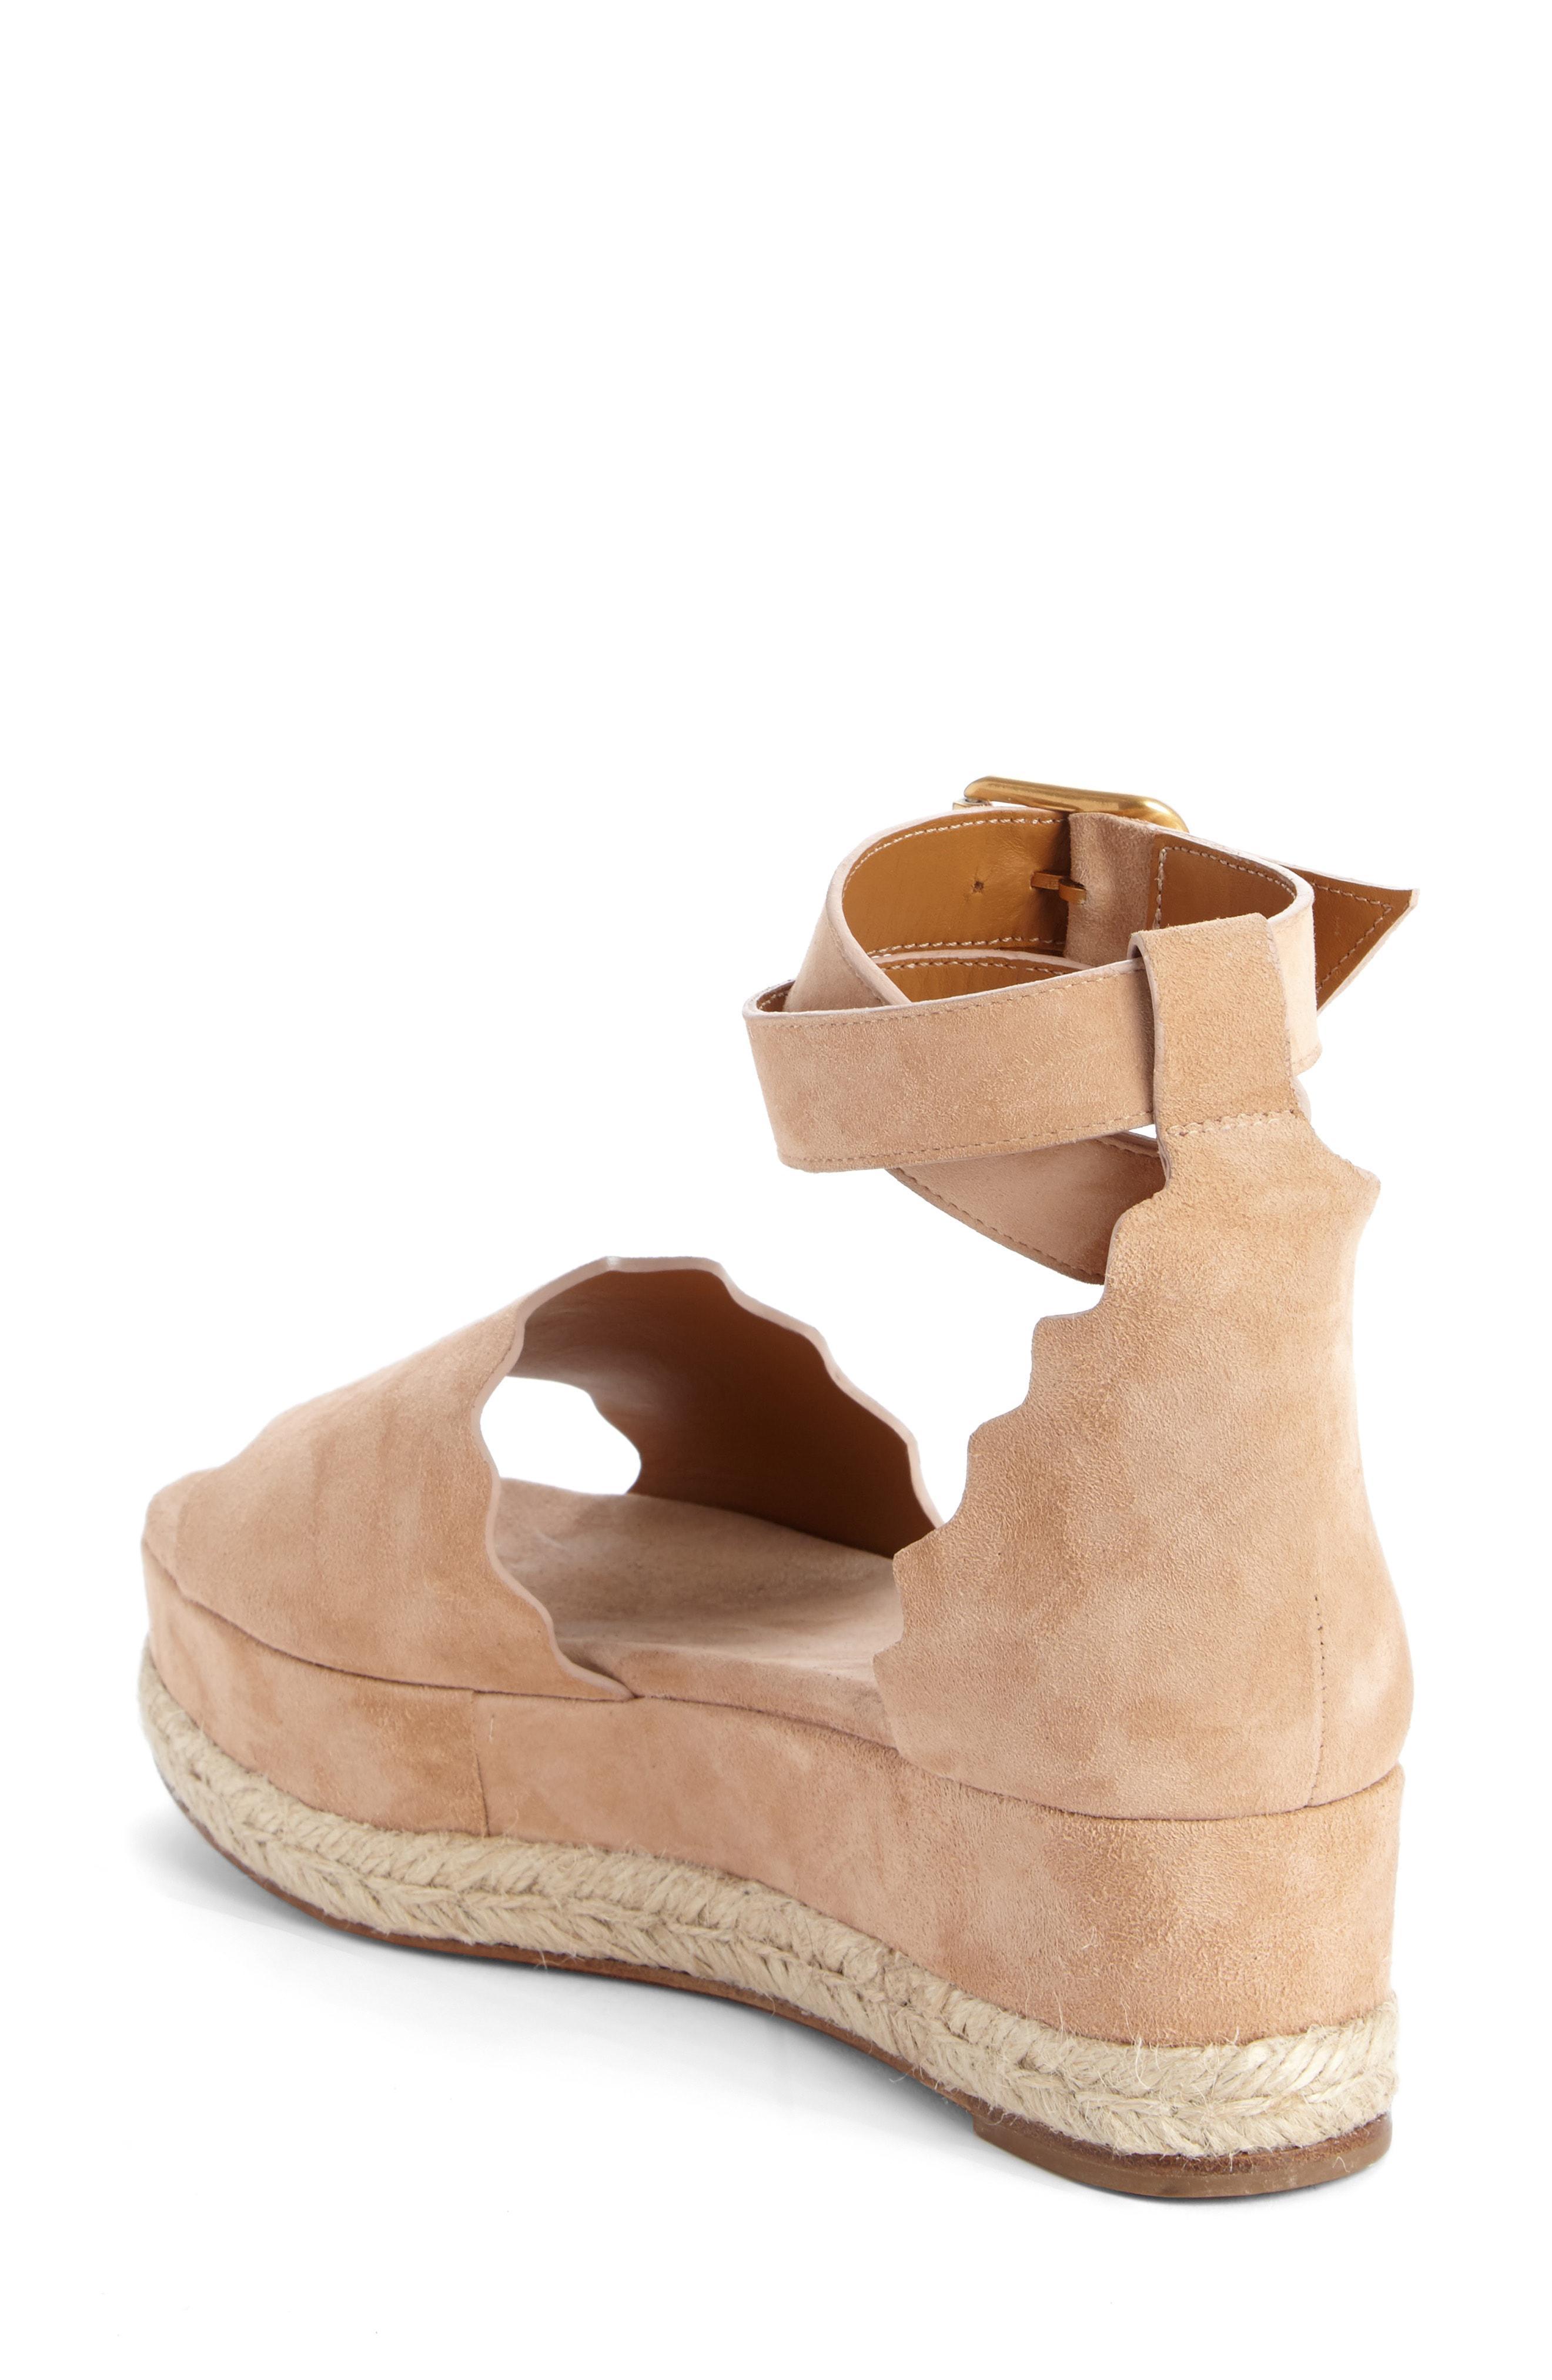 1f7c52bb292 Lyst - Chloé Lauren Espadrille Wedge Sandal in Brown